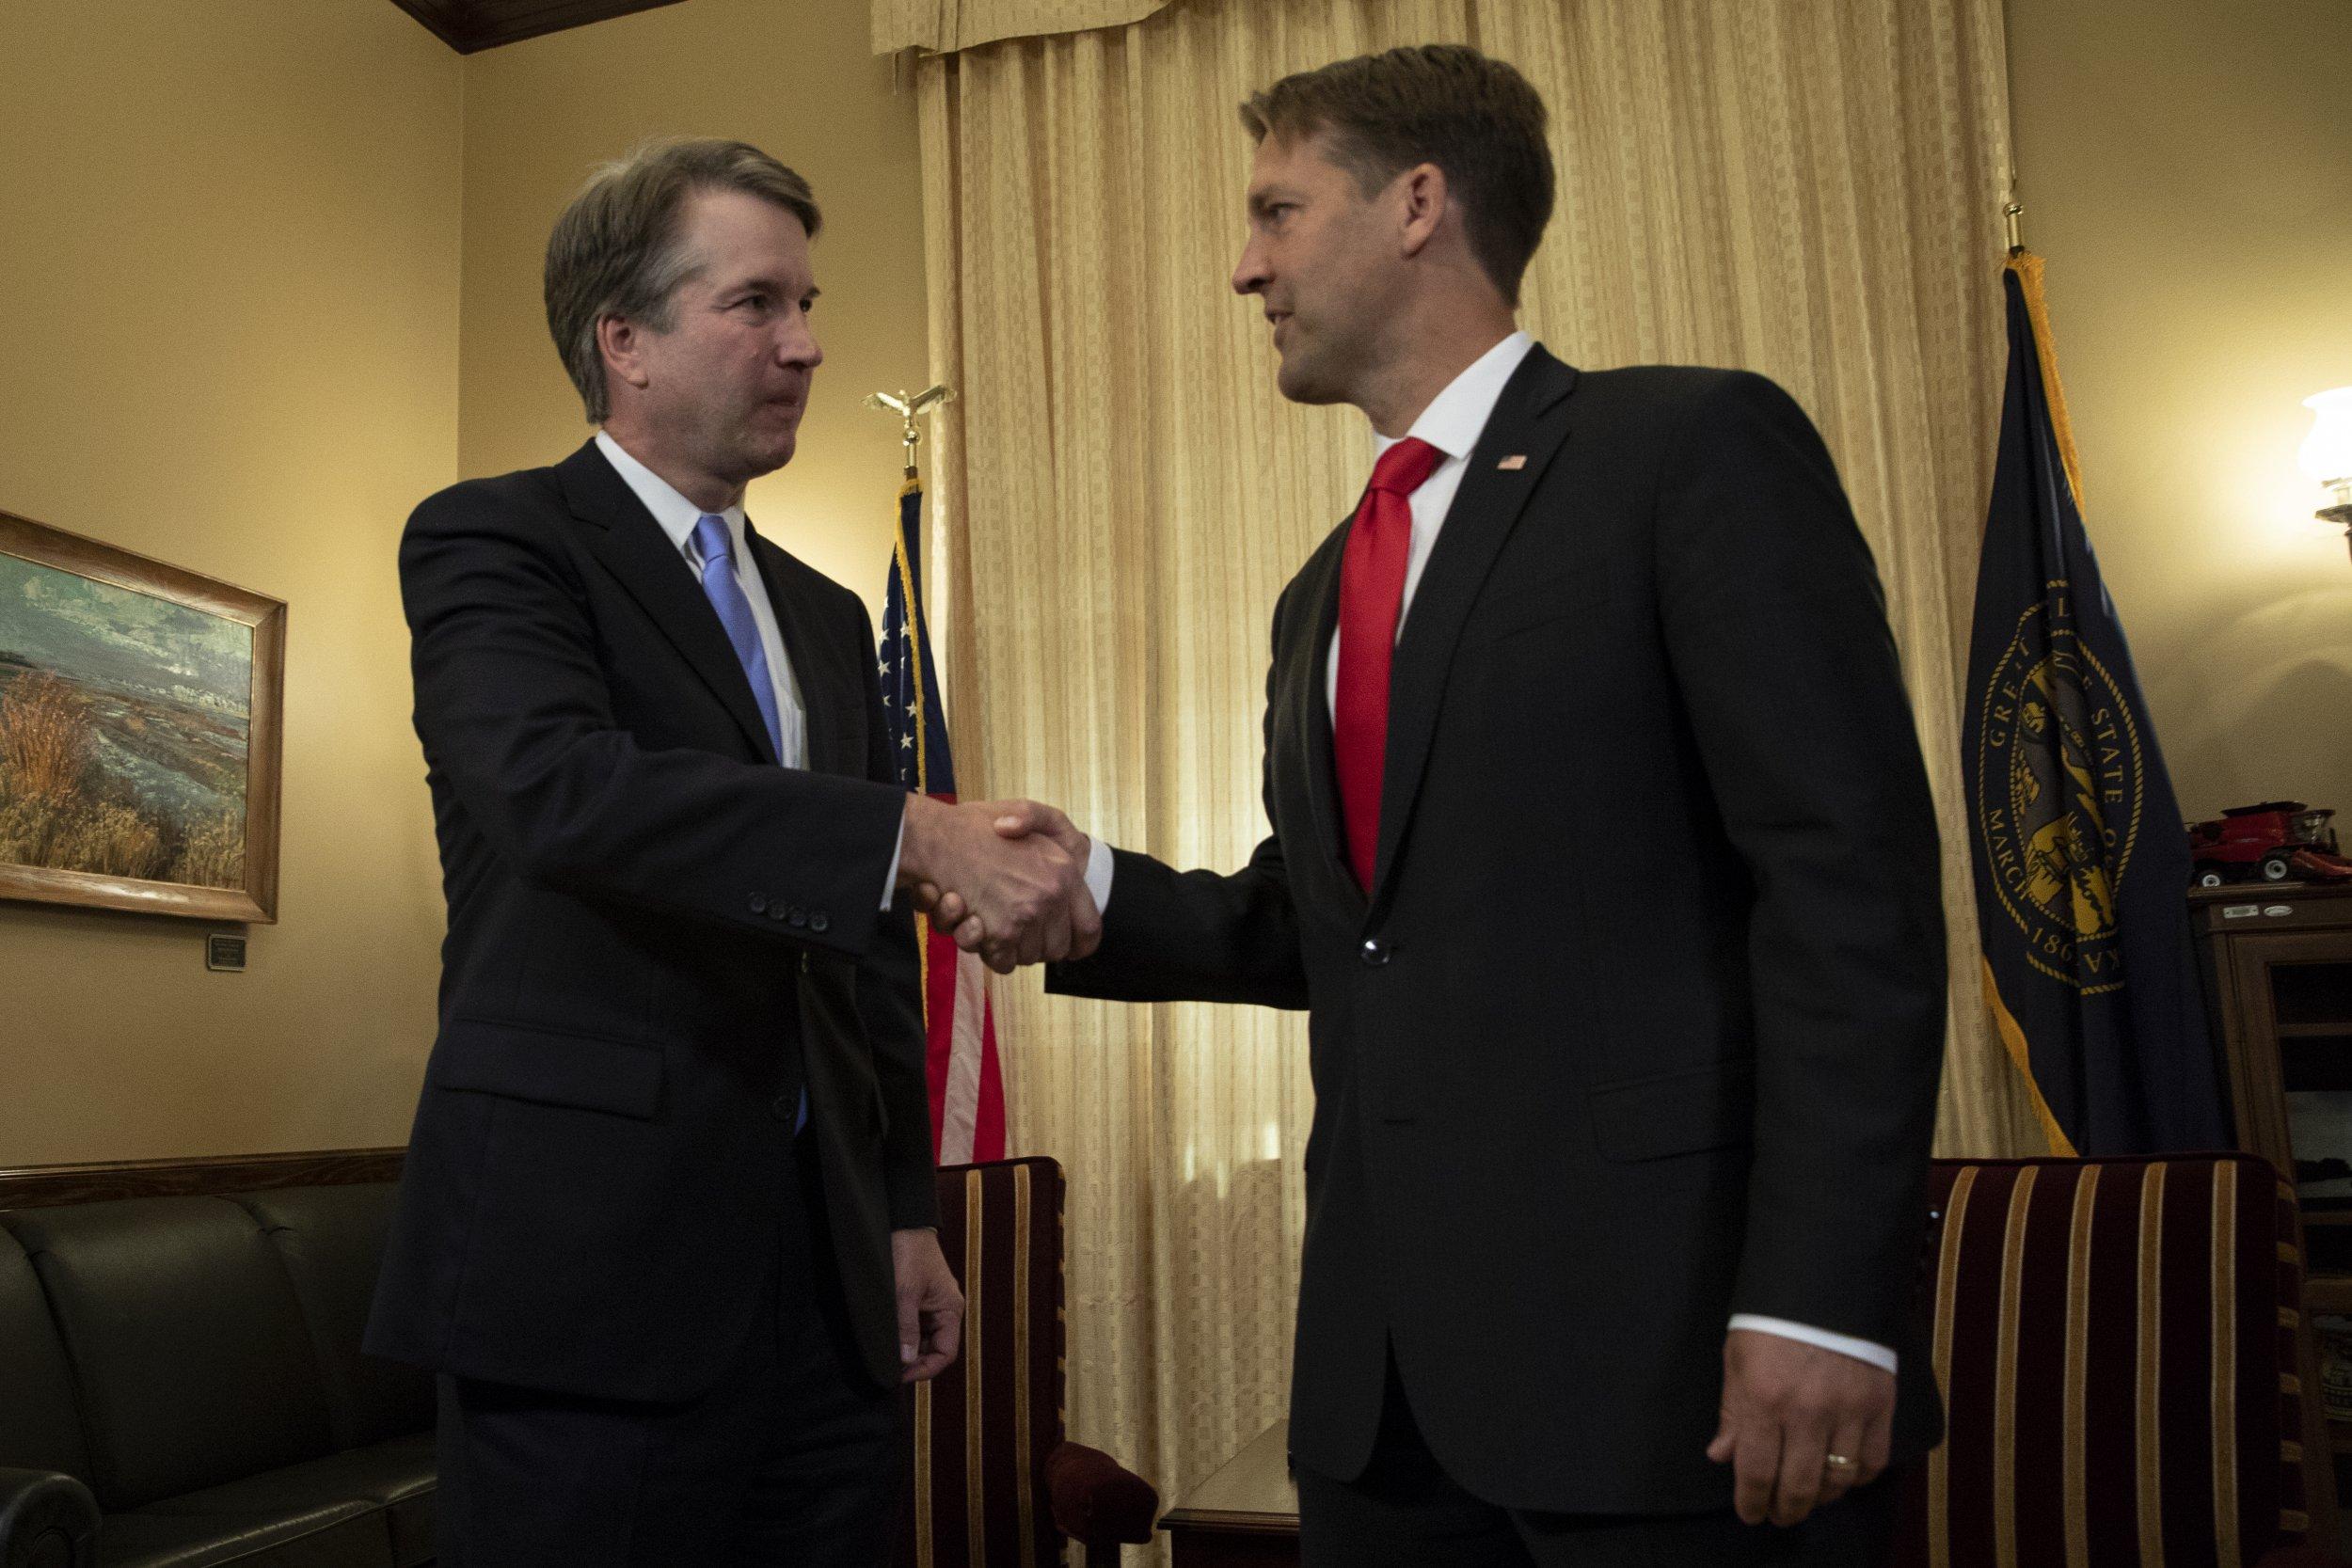 Ben Sasse, Brett Kavanaugh Sexual Assault Allegations, Trump Nominate a Woman